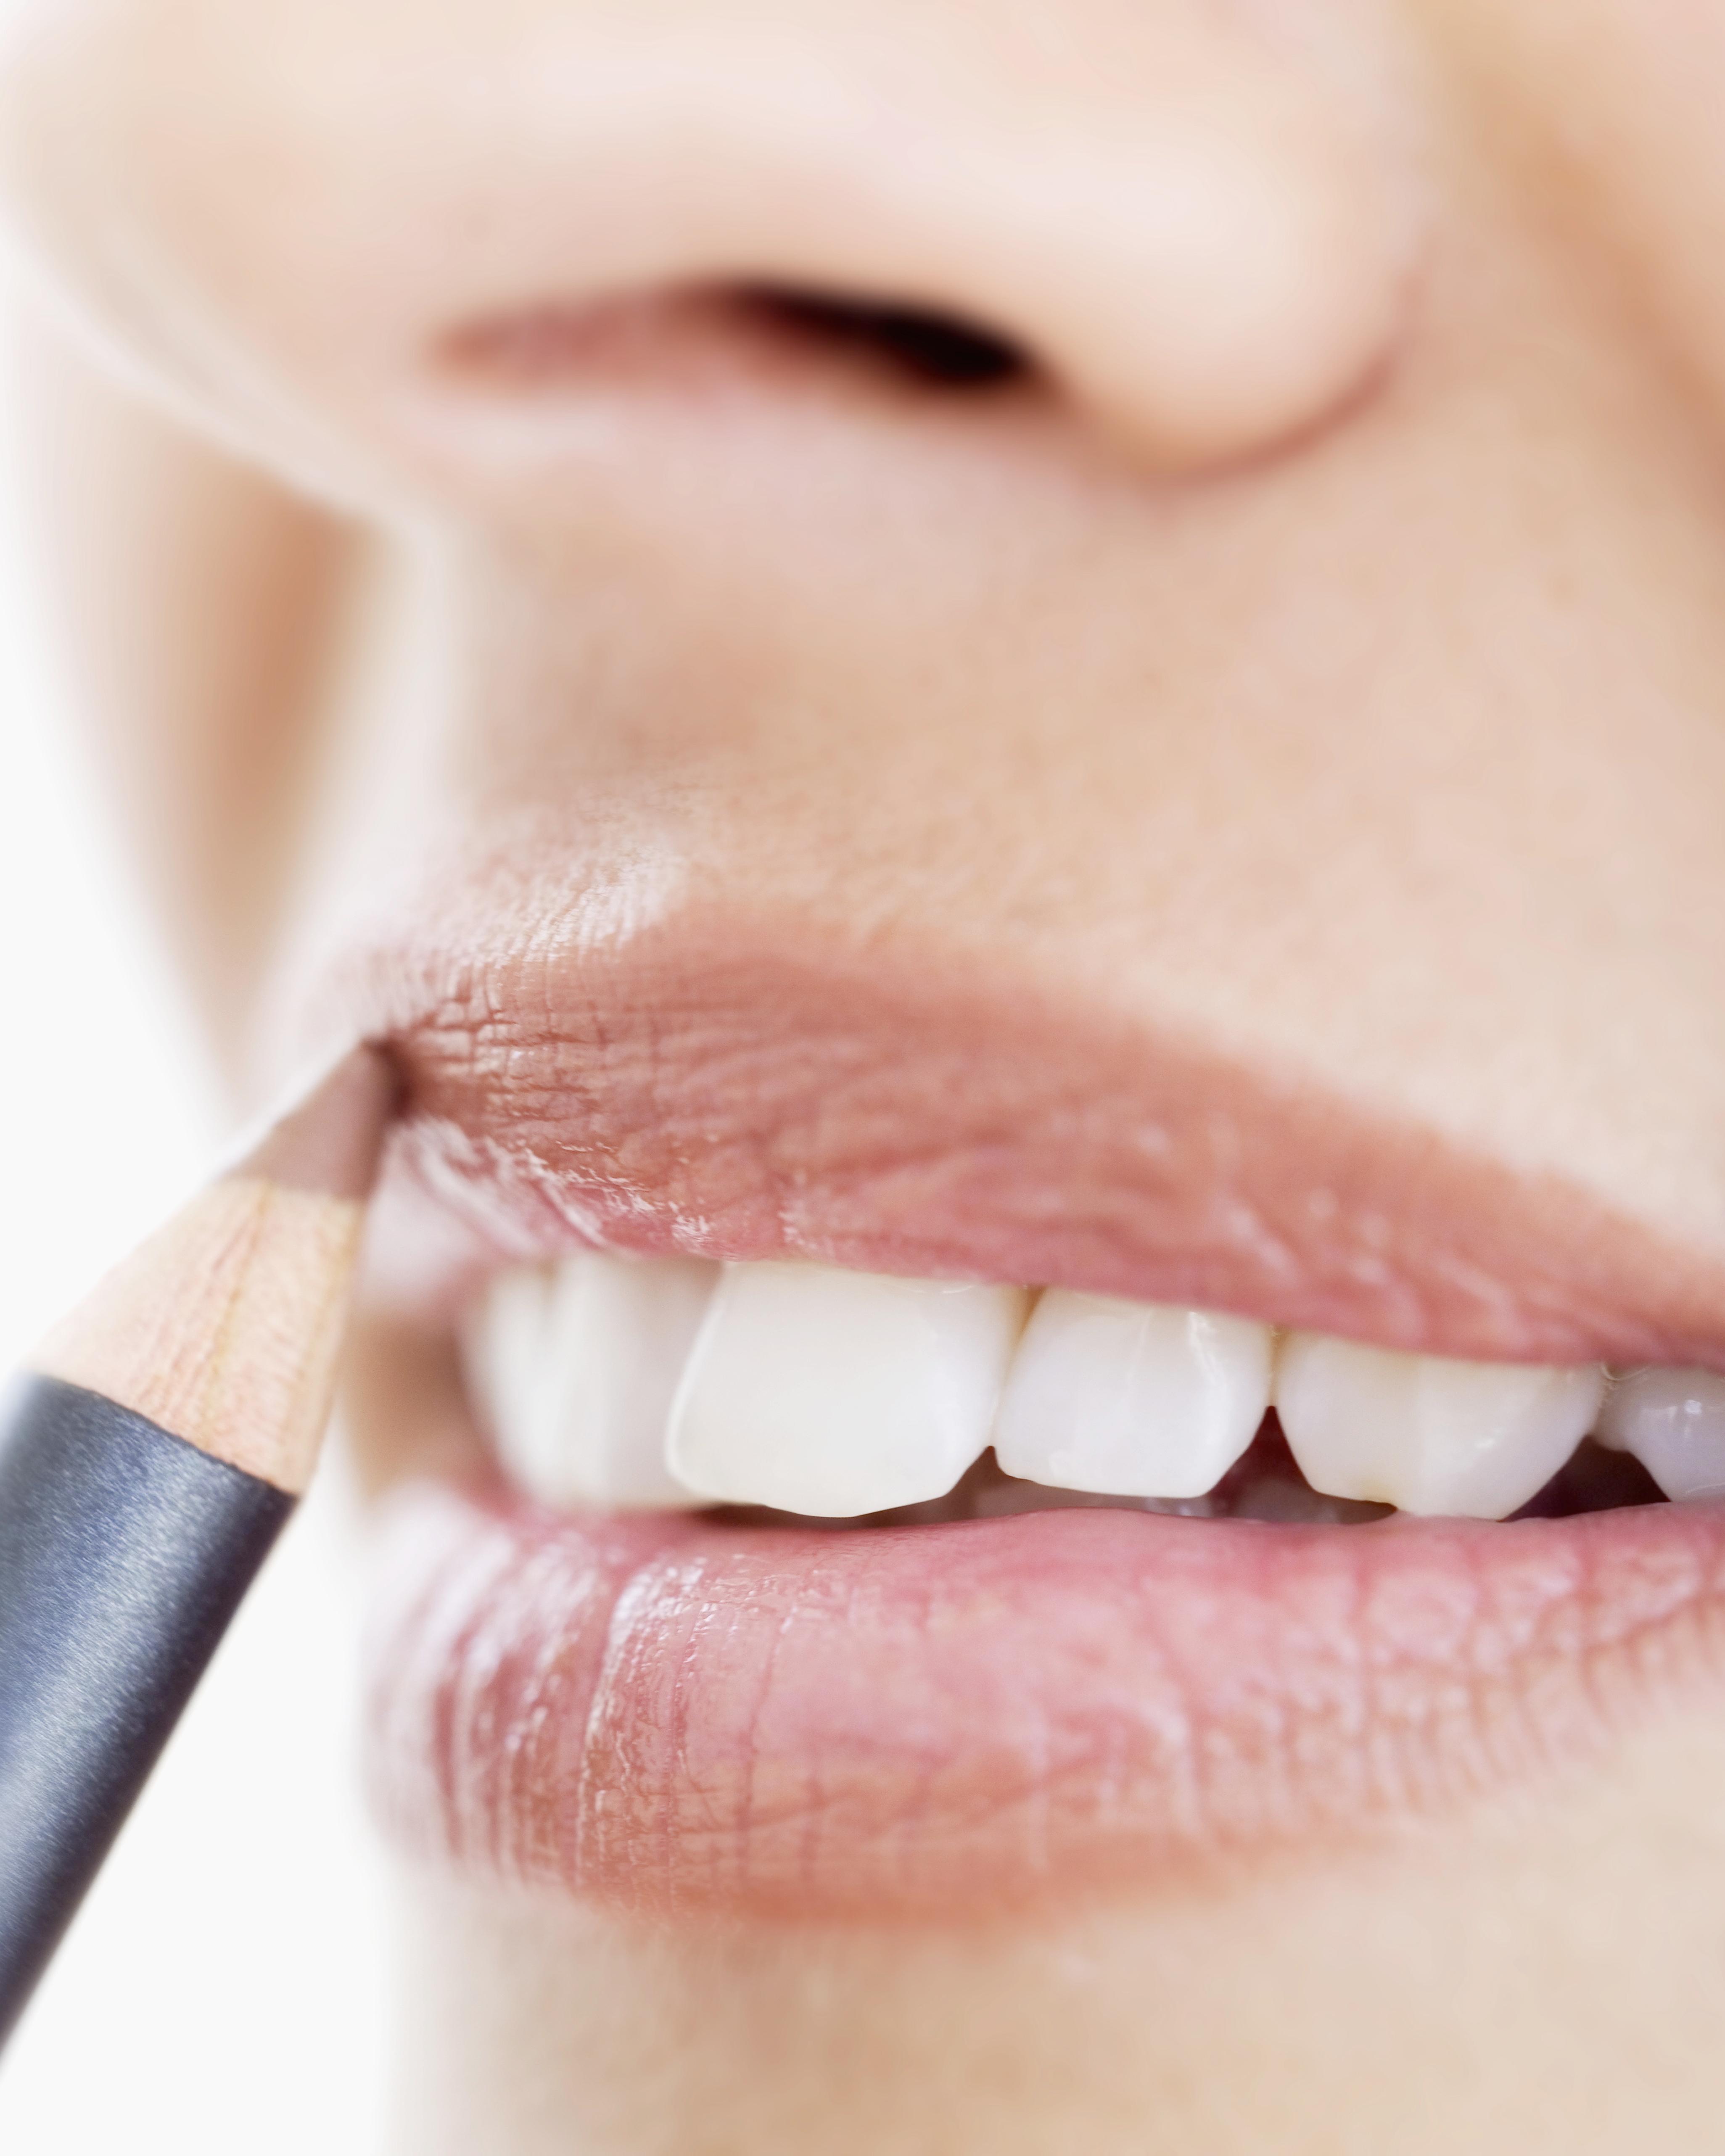 bc-smile-lips-3-getty-57308154.jpg